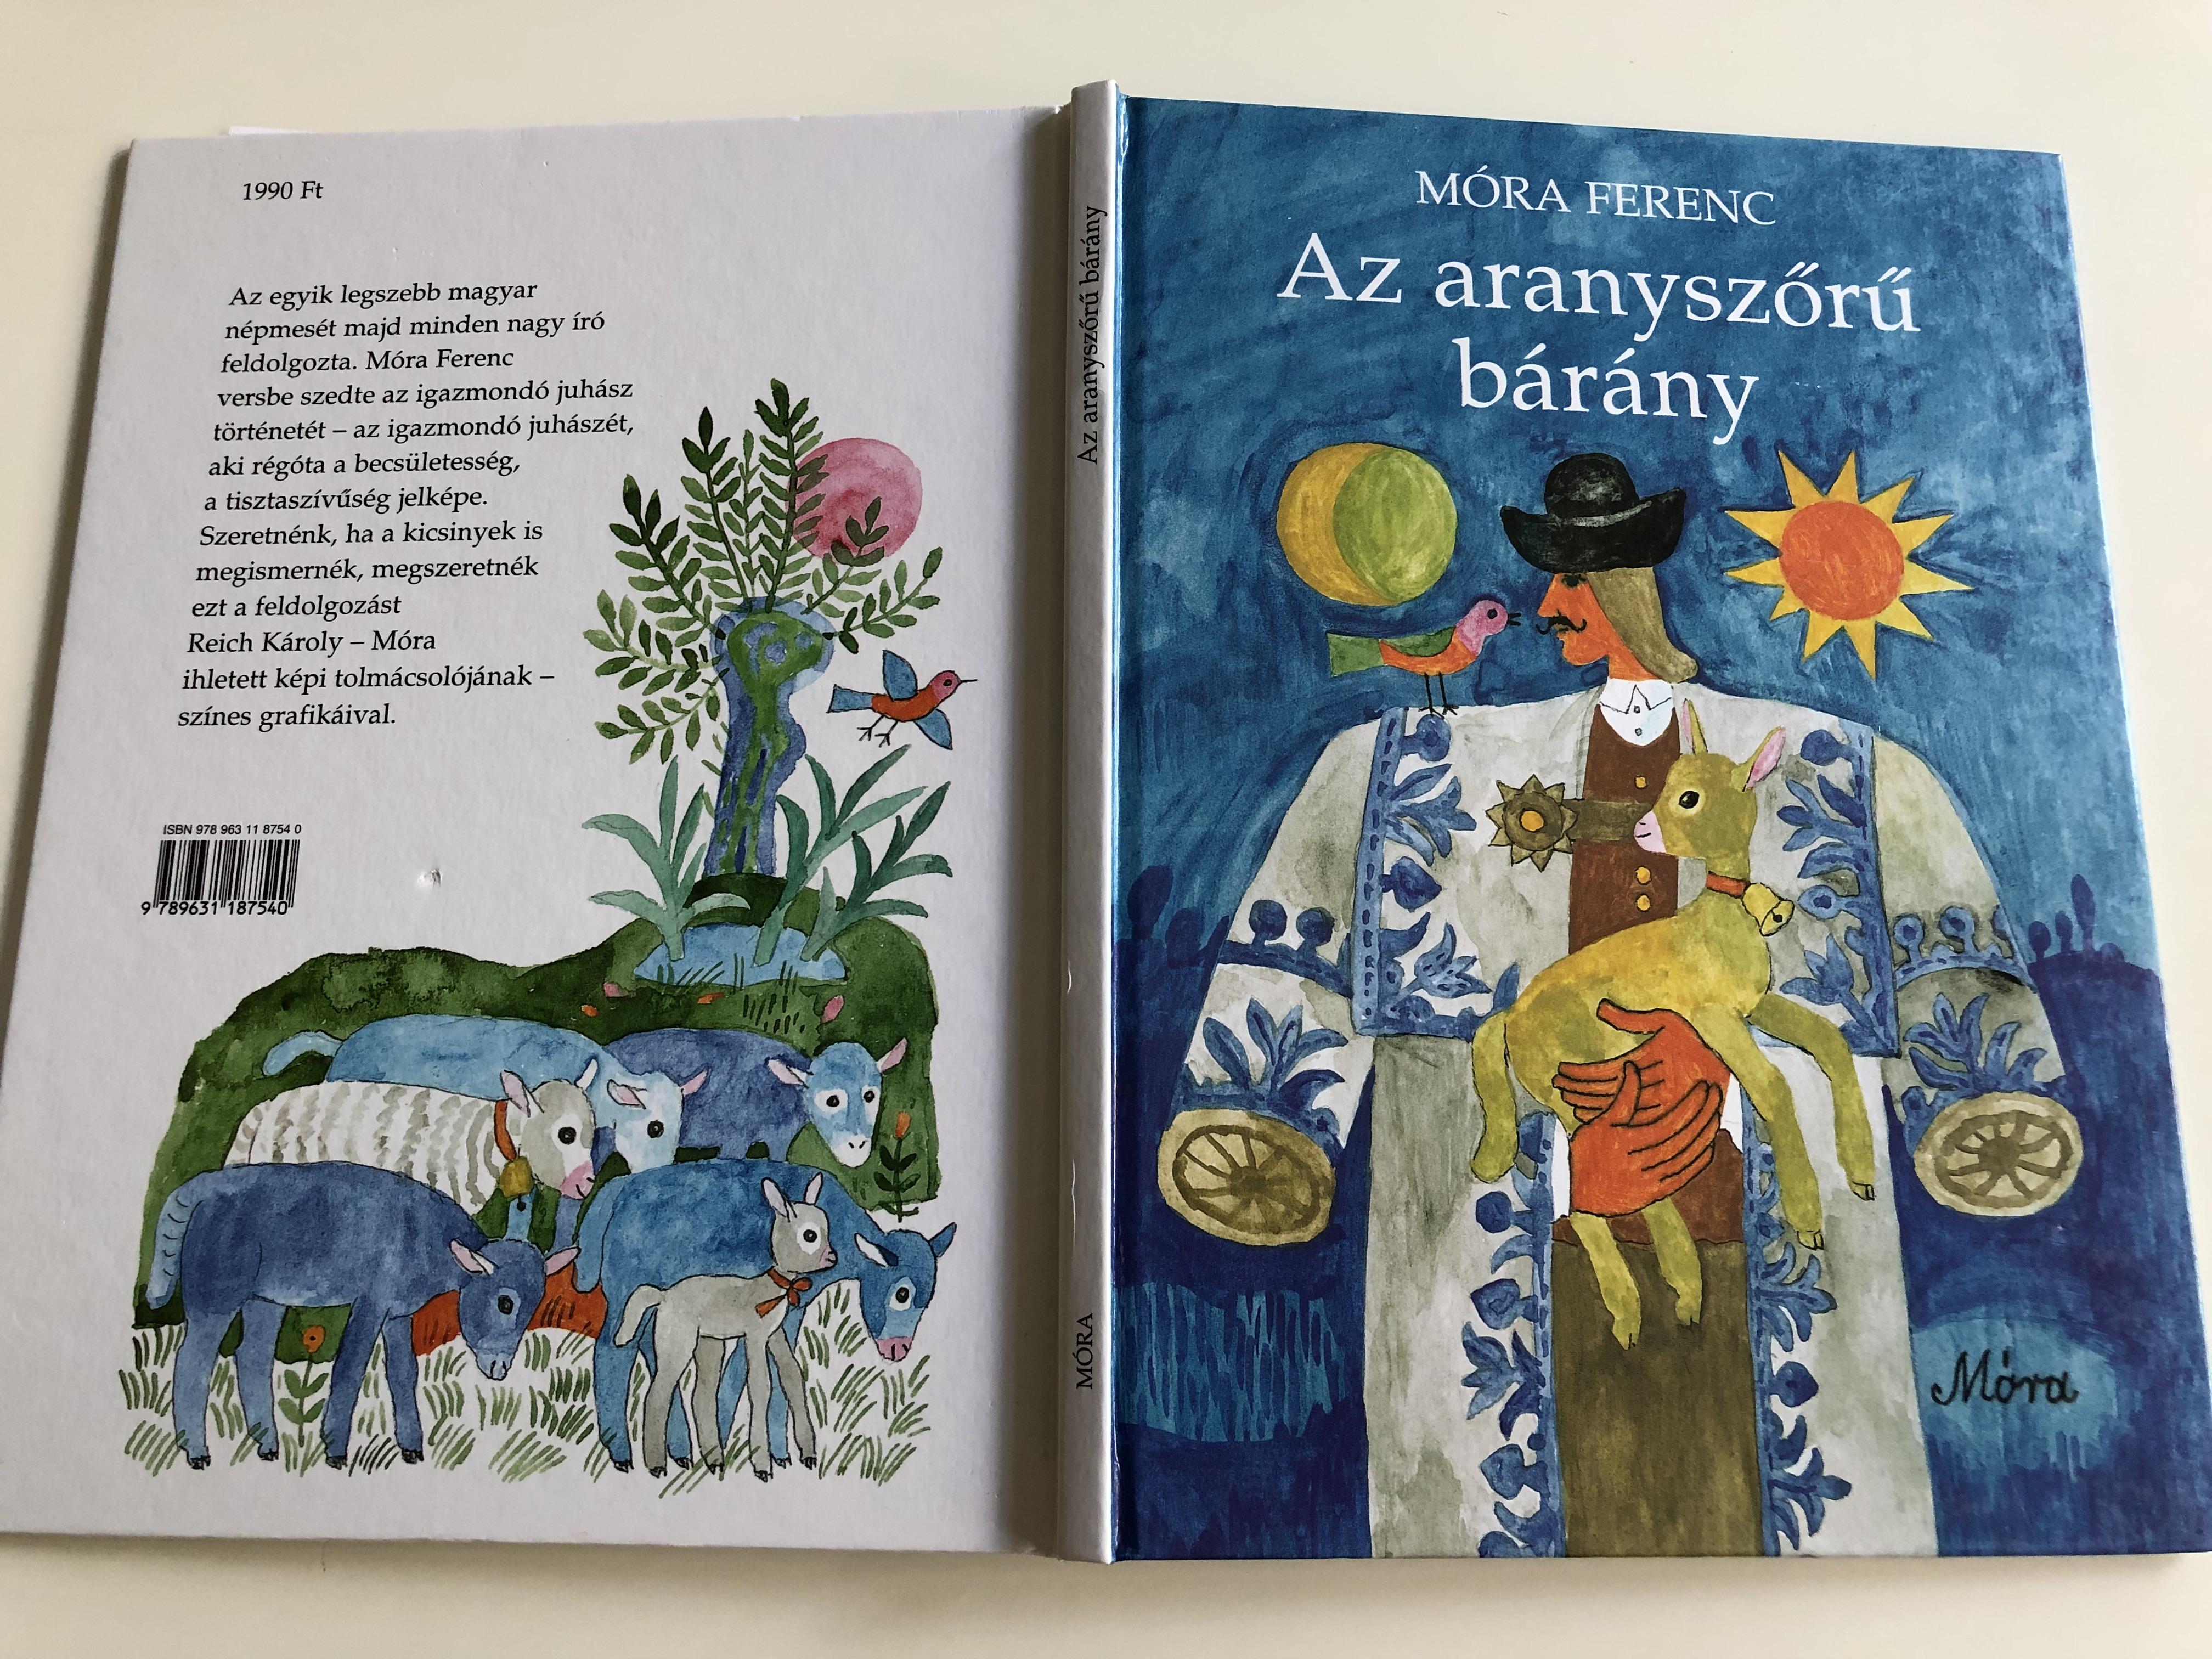 az-aranysz-r-b-r-ny-by-m-ra-ferenc-hungarian-folk-tale-reich-k-roly-rajzaival-5th-edition-m-ra-k-nyvkiad-2010-8-.jpg